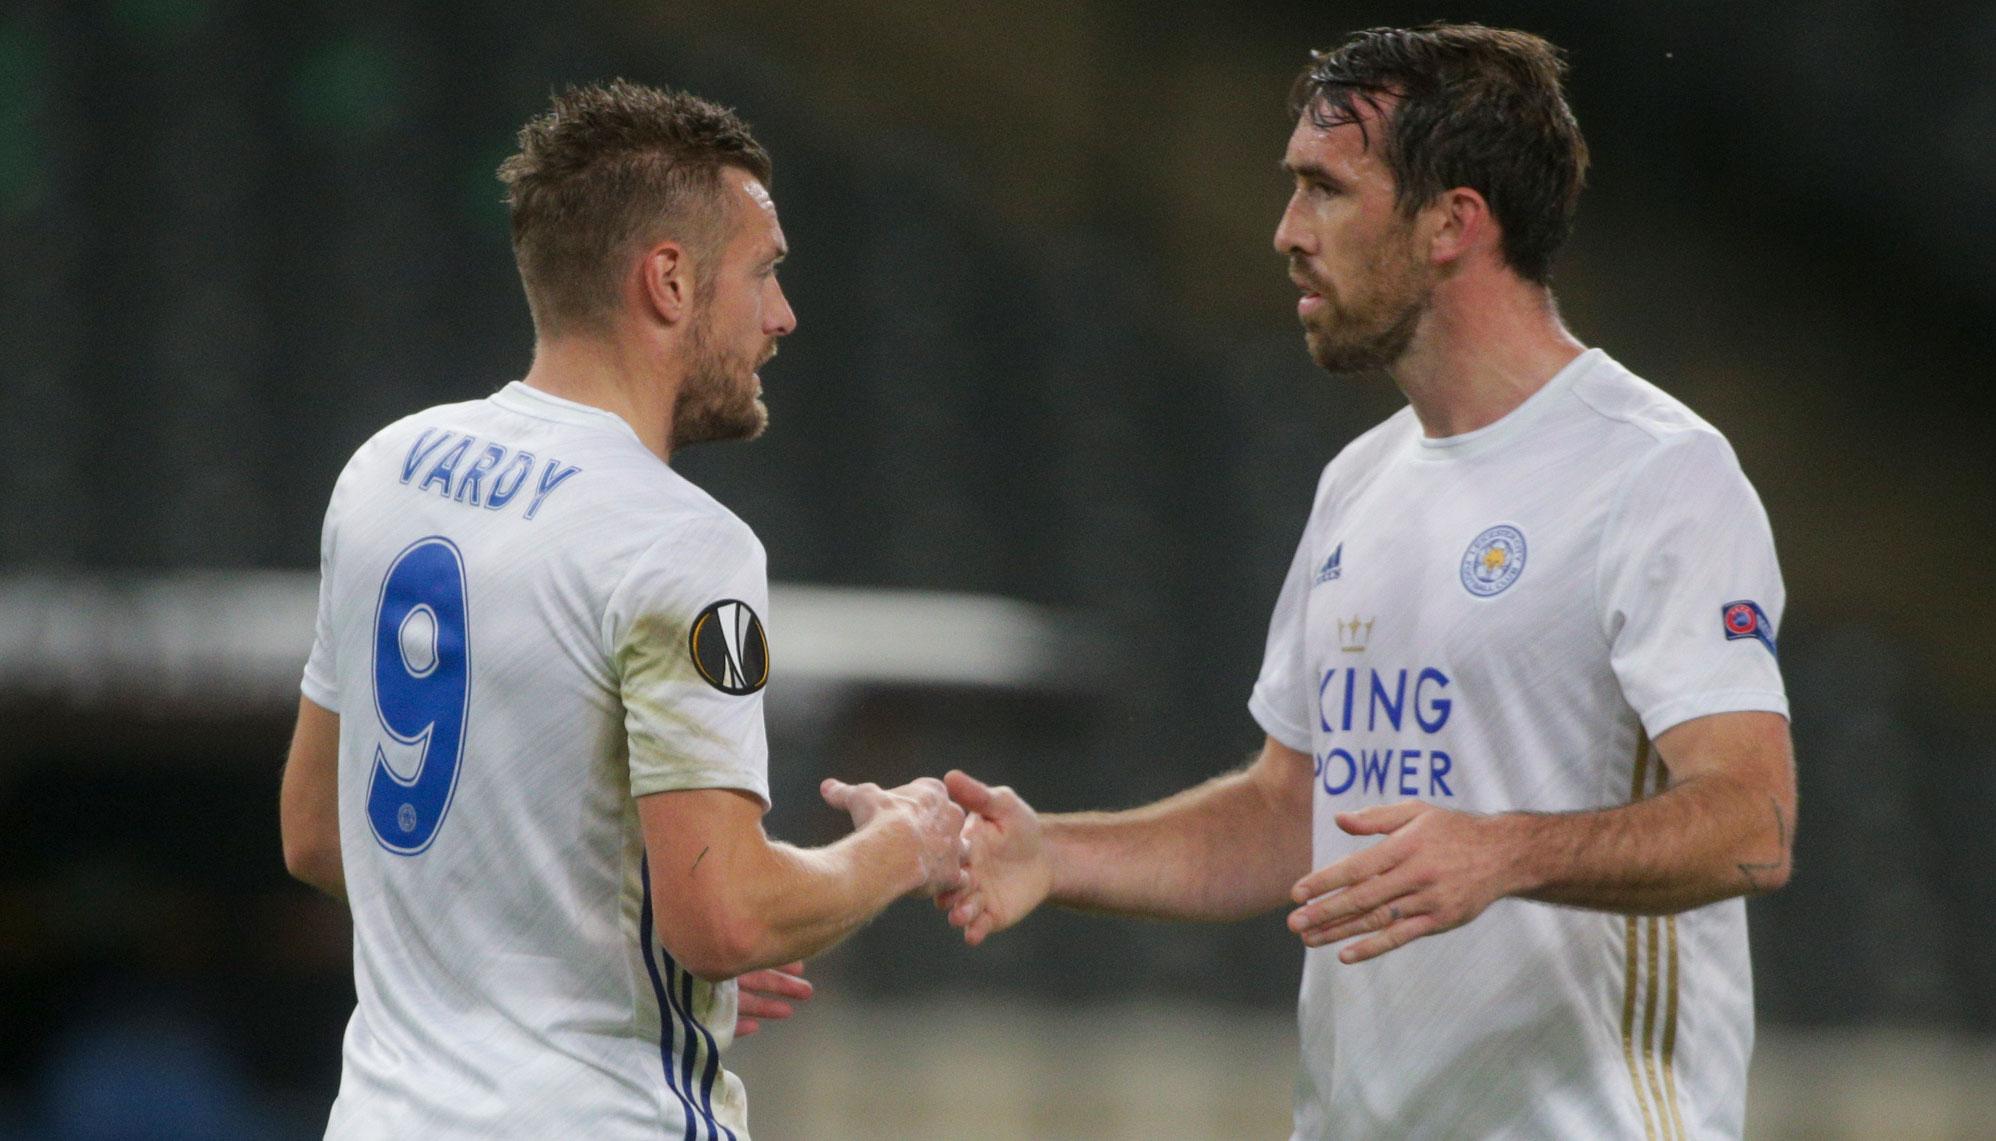 Leeds vs Leicester: Impressive duo hard to split